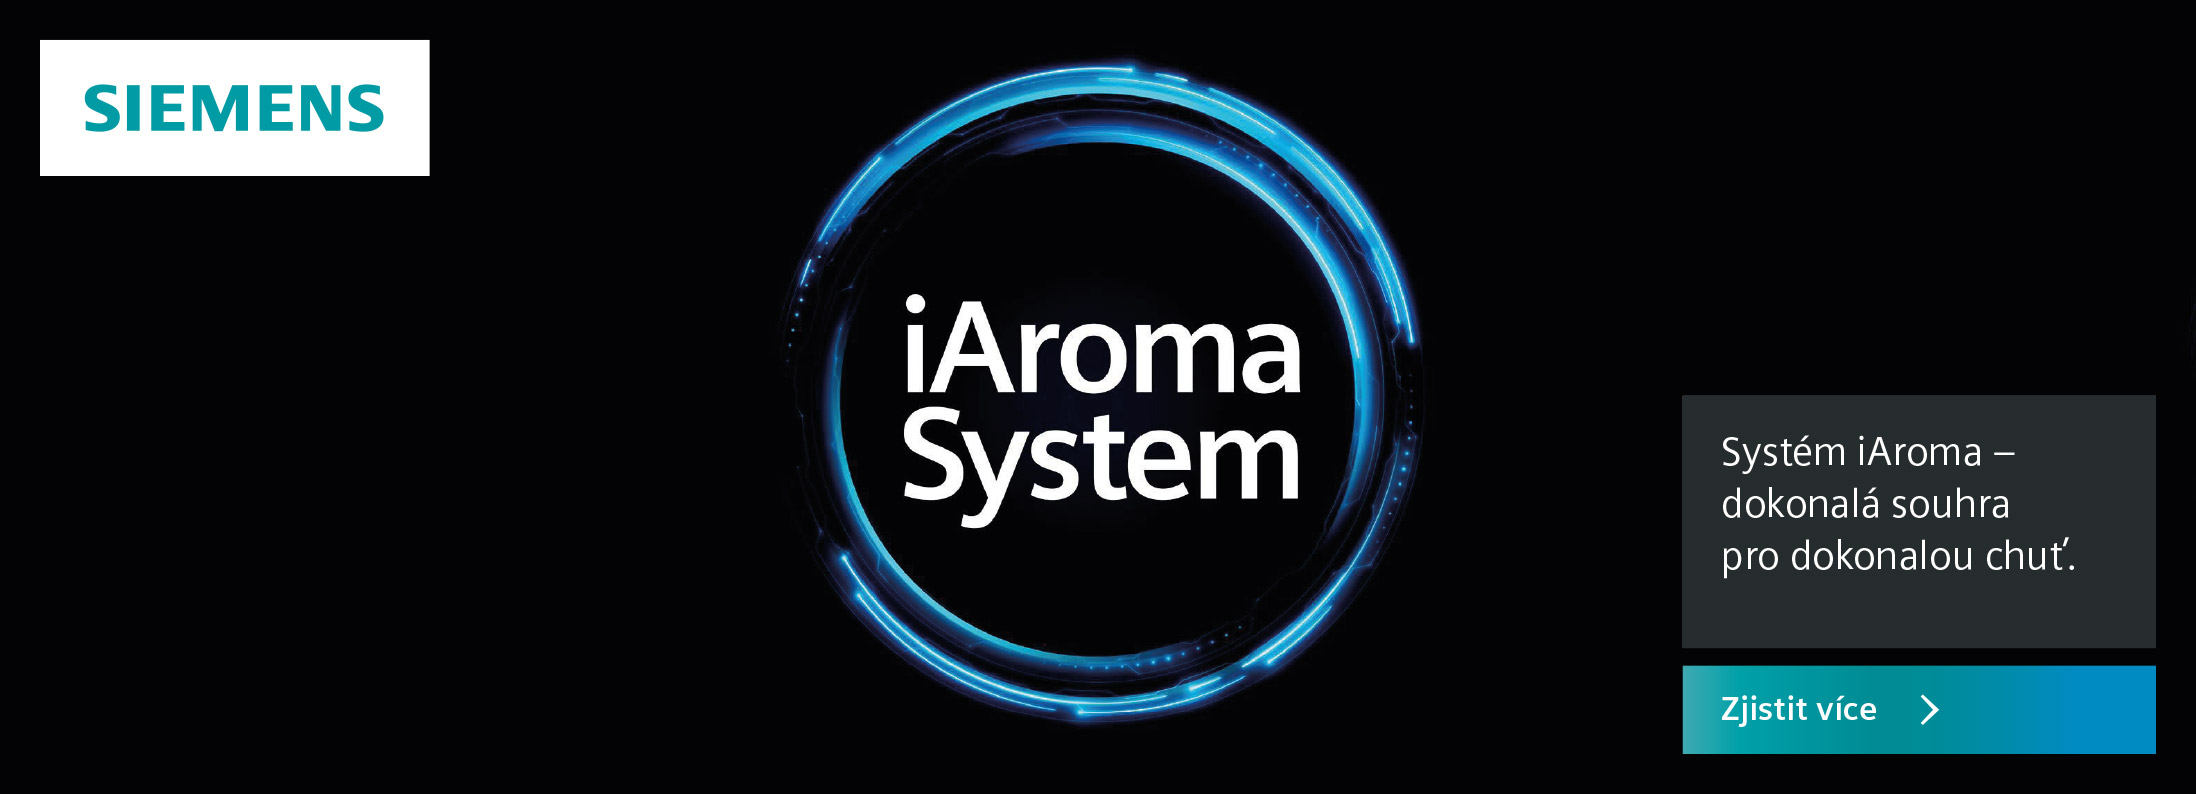 Siemens - Systém iAroma